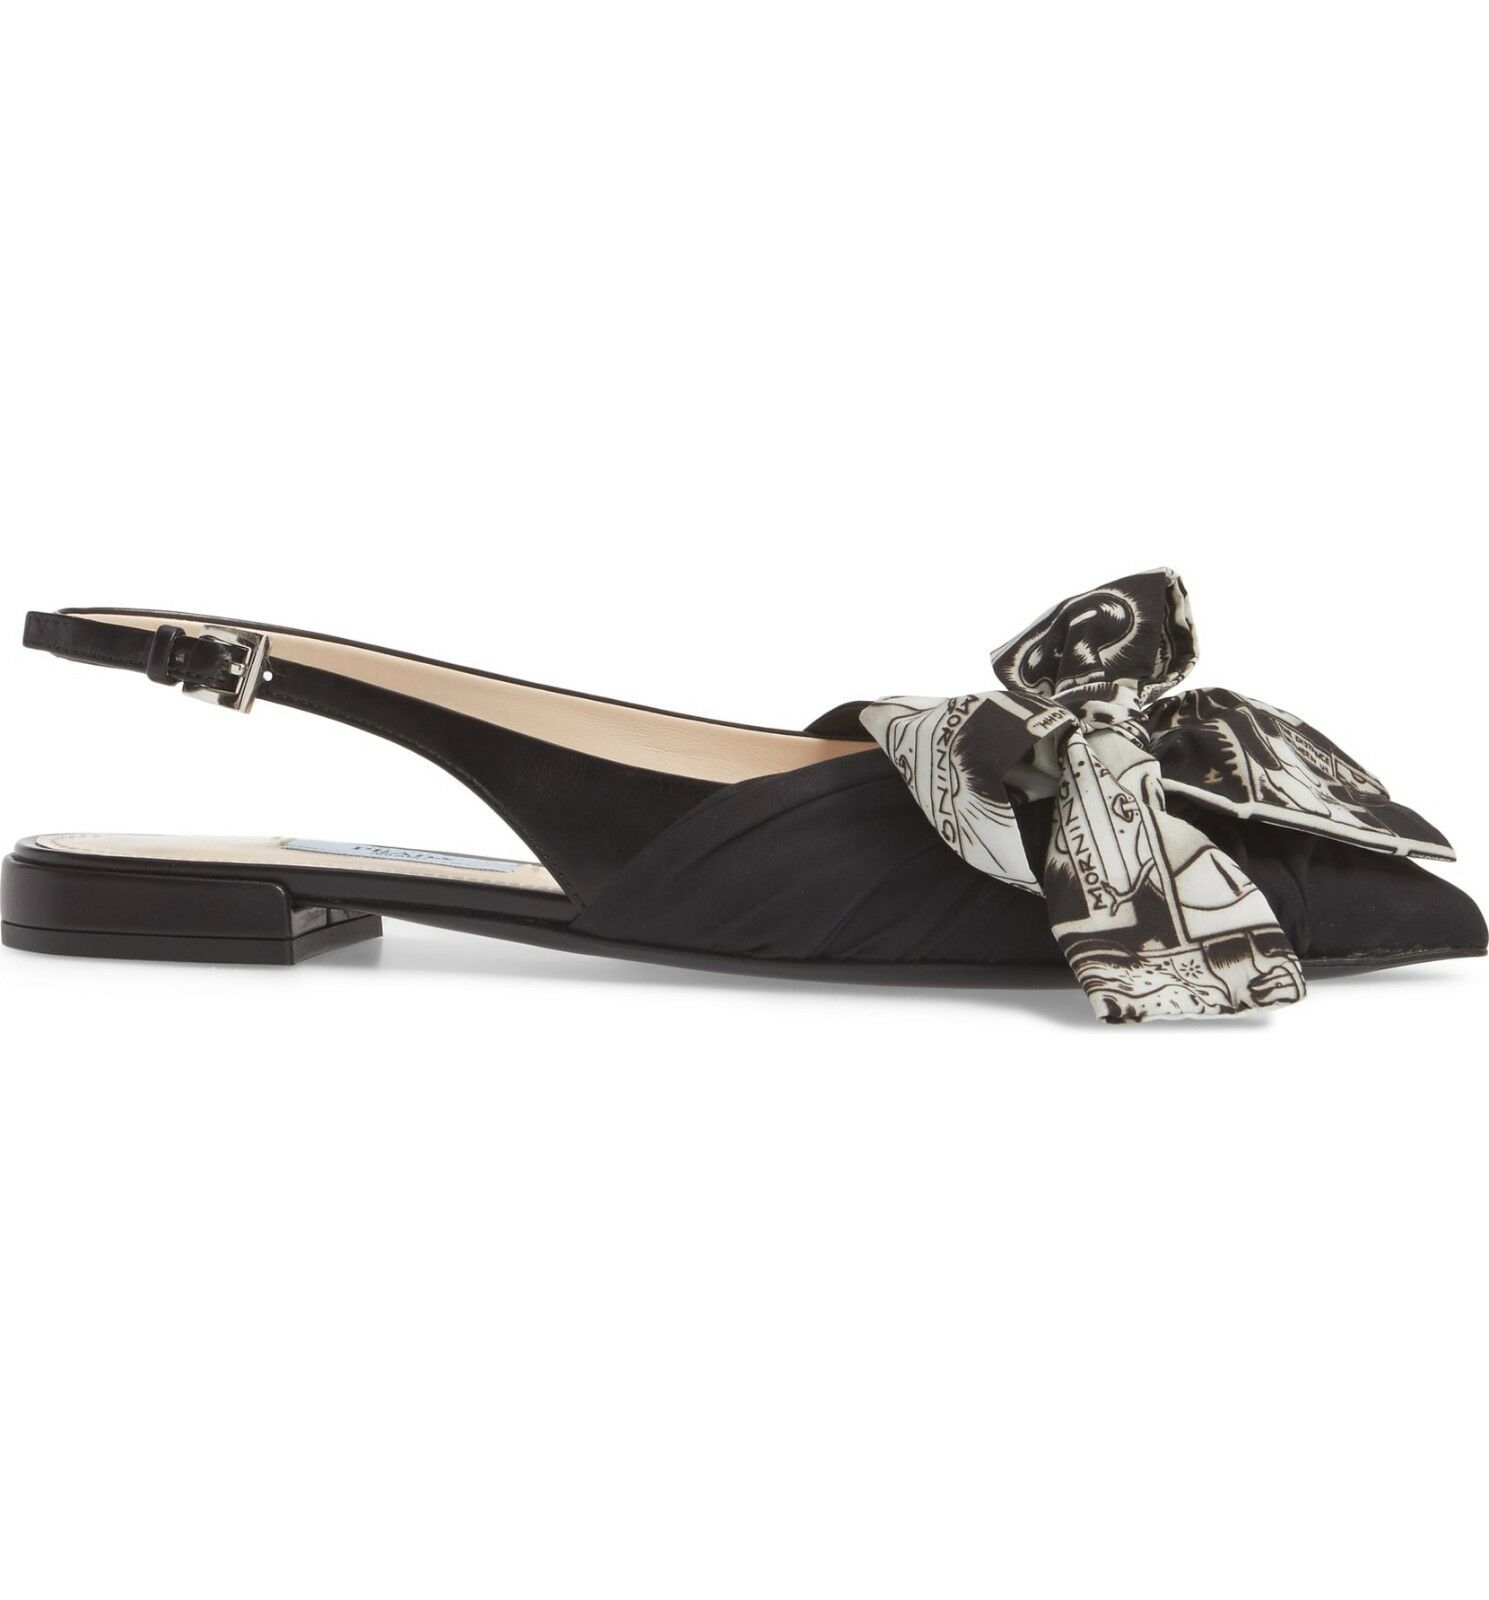 NIB NEW Prada women black bow flats slingback flats bow sandals shoes 38 US 8 c7640c